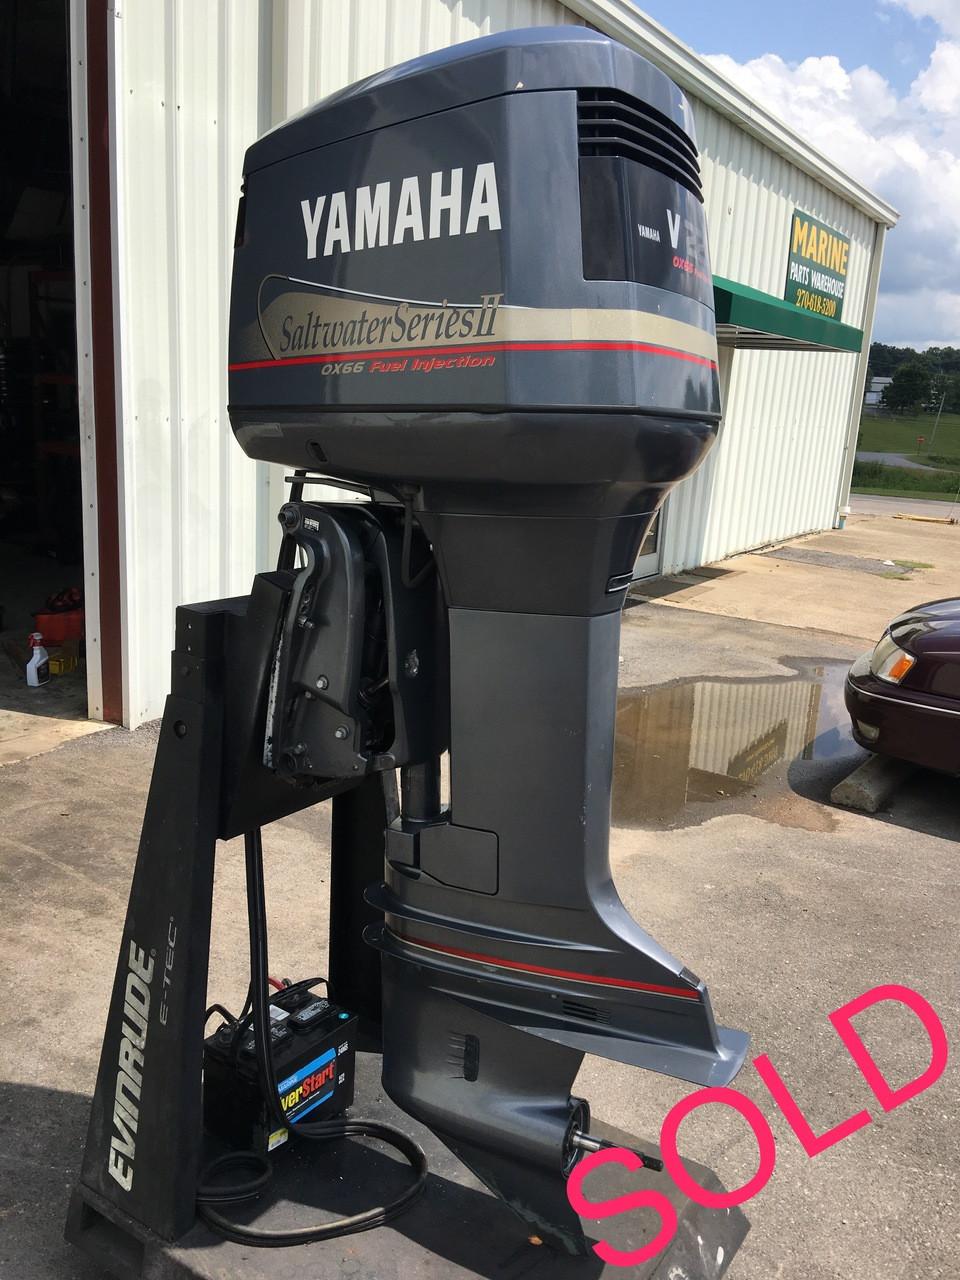 2001 Yamaha V225 Saler Series II OX66 Fuel Injection 3.1L V6 2 ... on yamaha solenoid diagram, yamaha motor diagram, yamaha ignition diagram, suzuki quadrunner 160 parts diagram, yamaha steering diagram, yamaha wiring code, yamaha schematics,